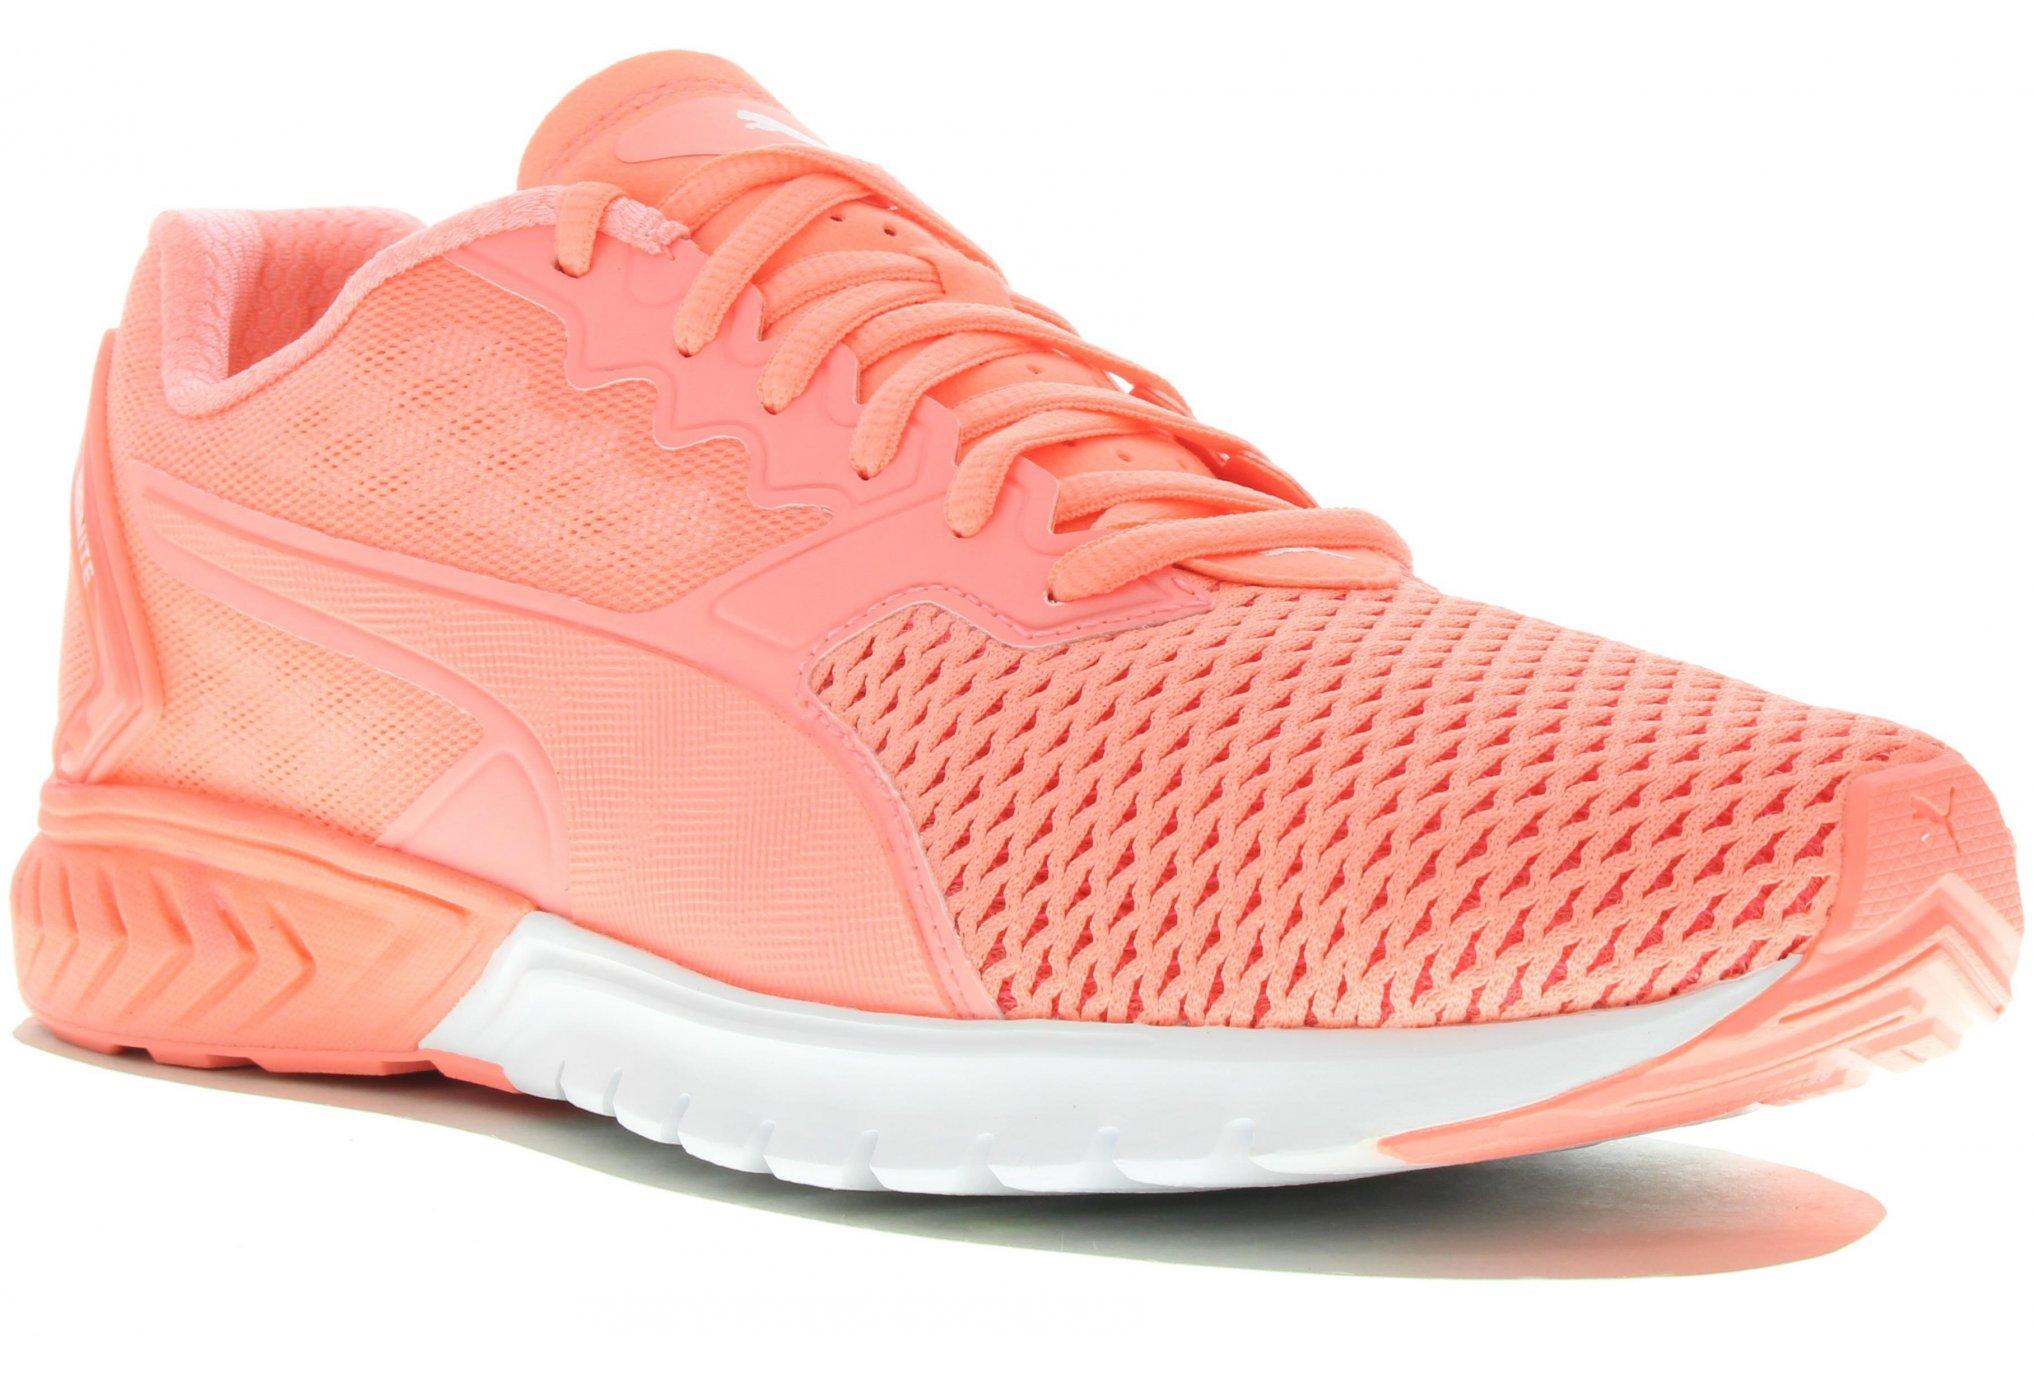 Chaussures Running Session Femme Ignite W Trail Puma V2 xWdBorCe